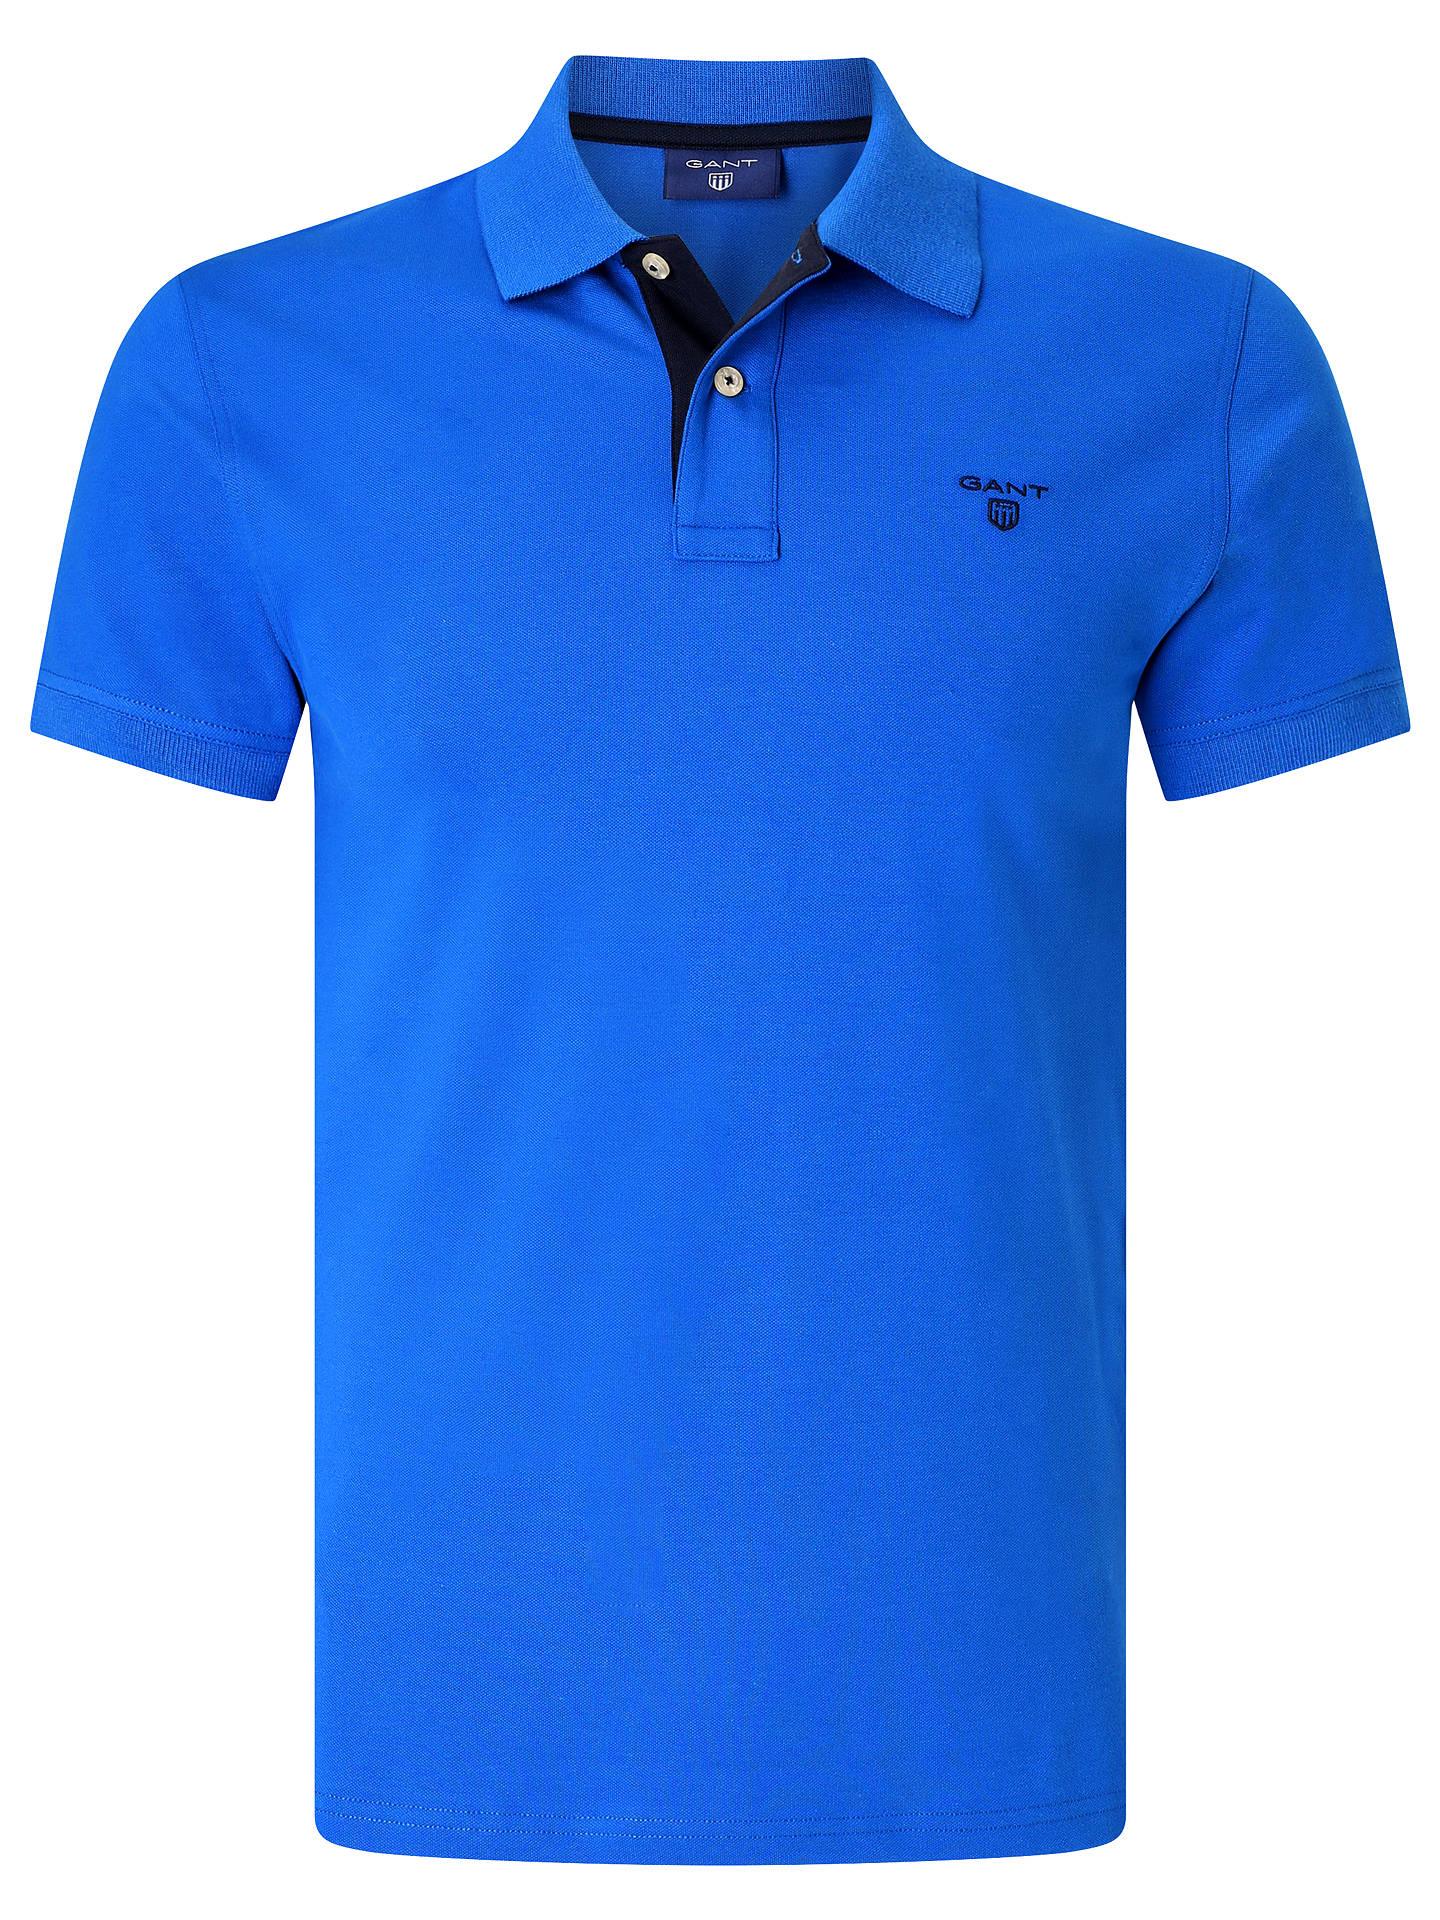 Contrast Gant amp; Polo Collar John Partners Shirt Lewis At 4UqUdr